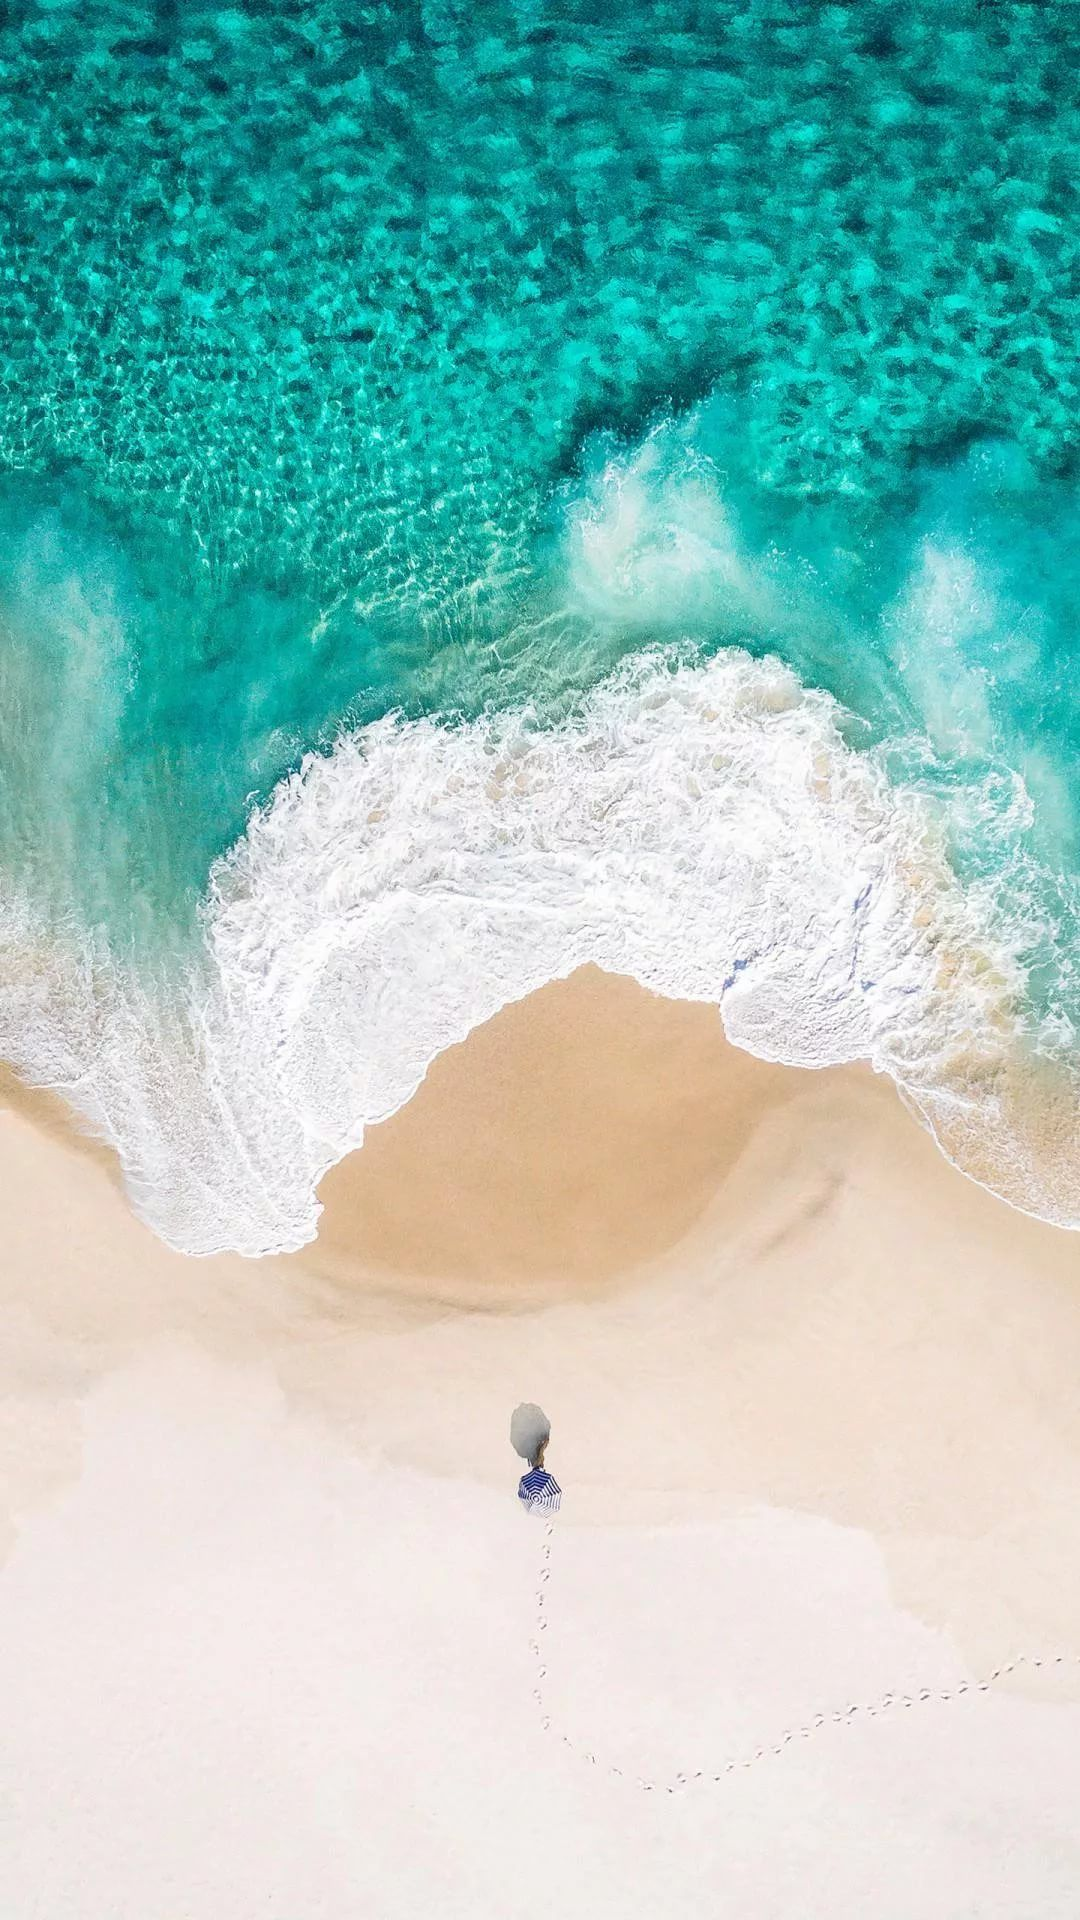 Beach Tumblr iPhone wallpaper